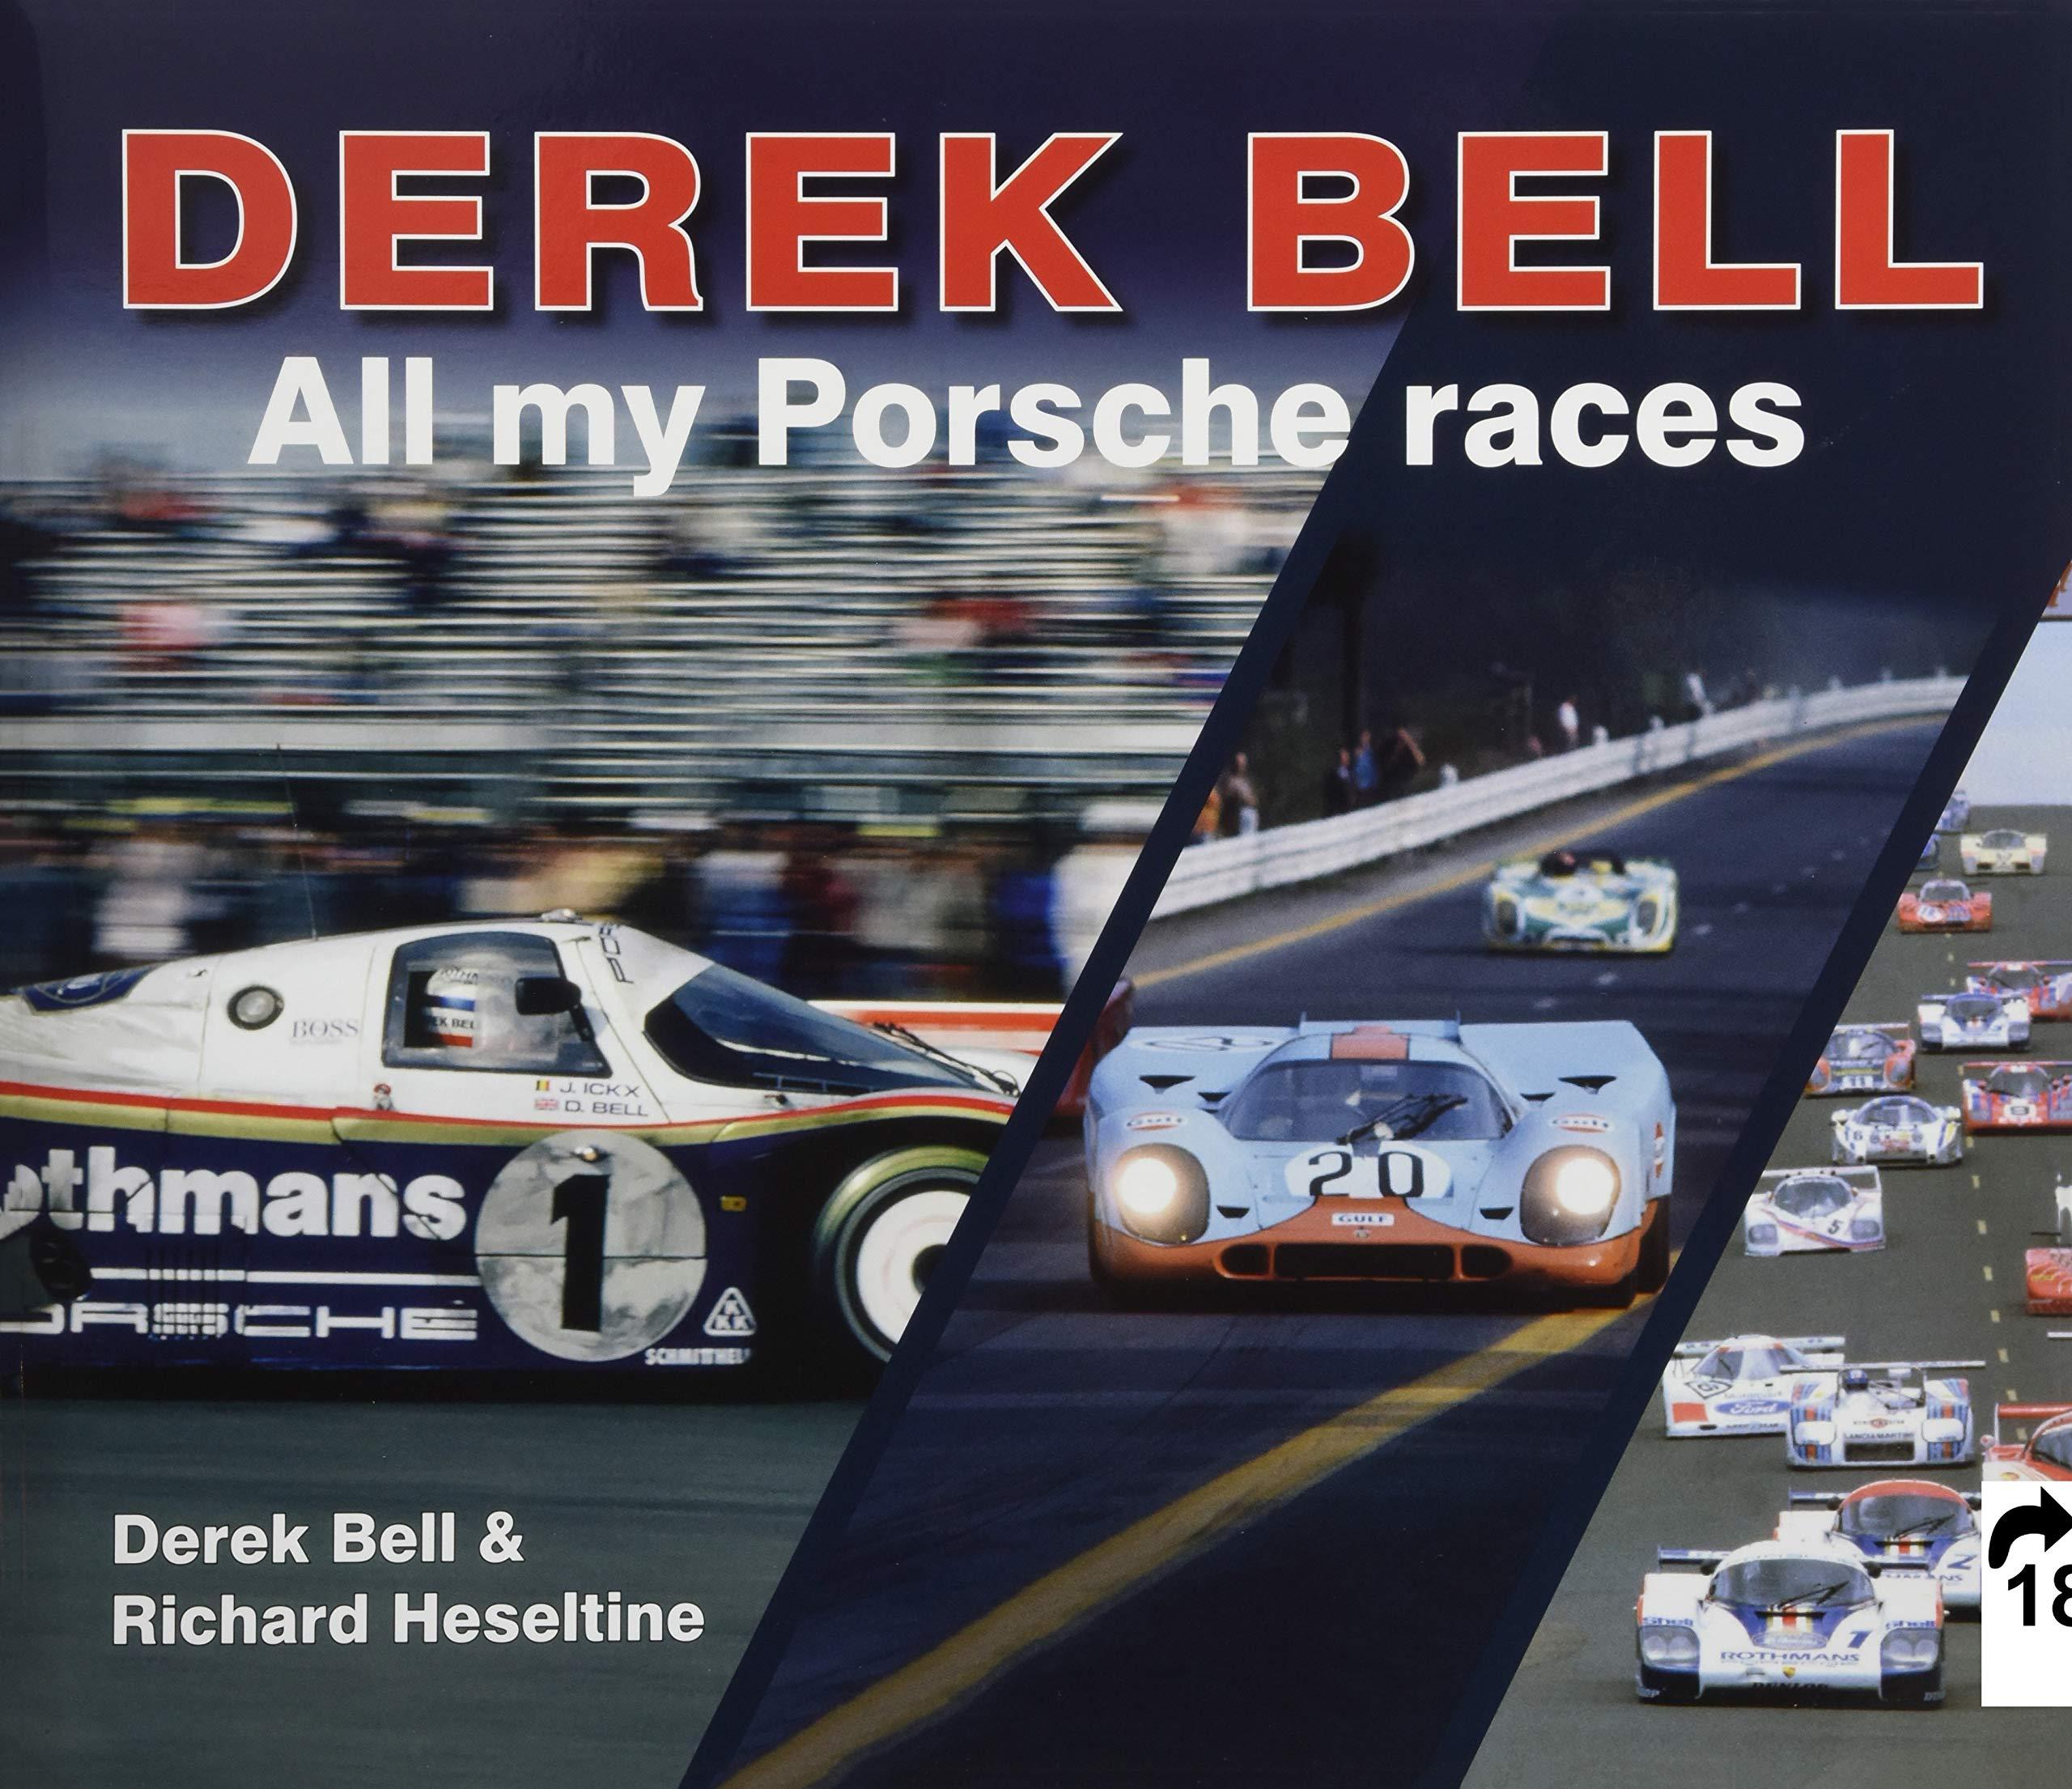 Derek Bell: All my Porsche races: Amazon.es: Richard Heseltine, Derek Bell: Libros en idiomas extranjeros